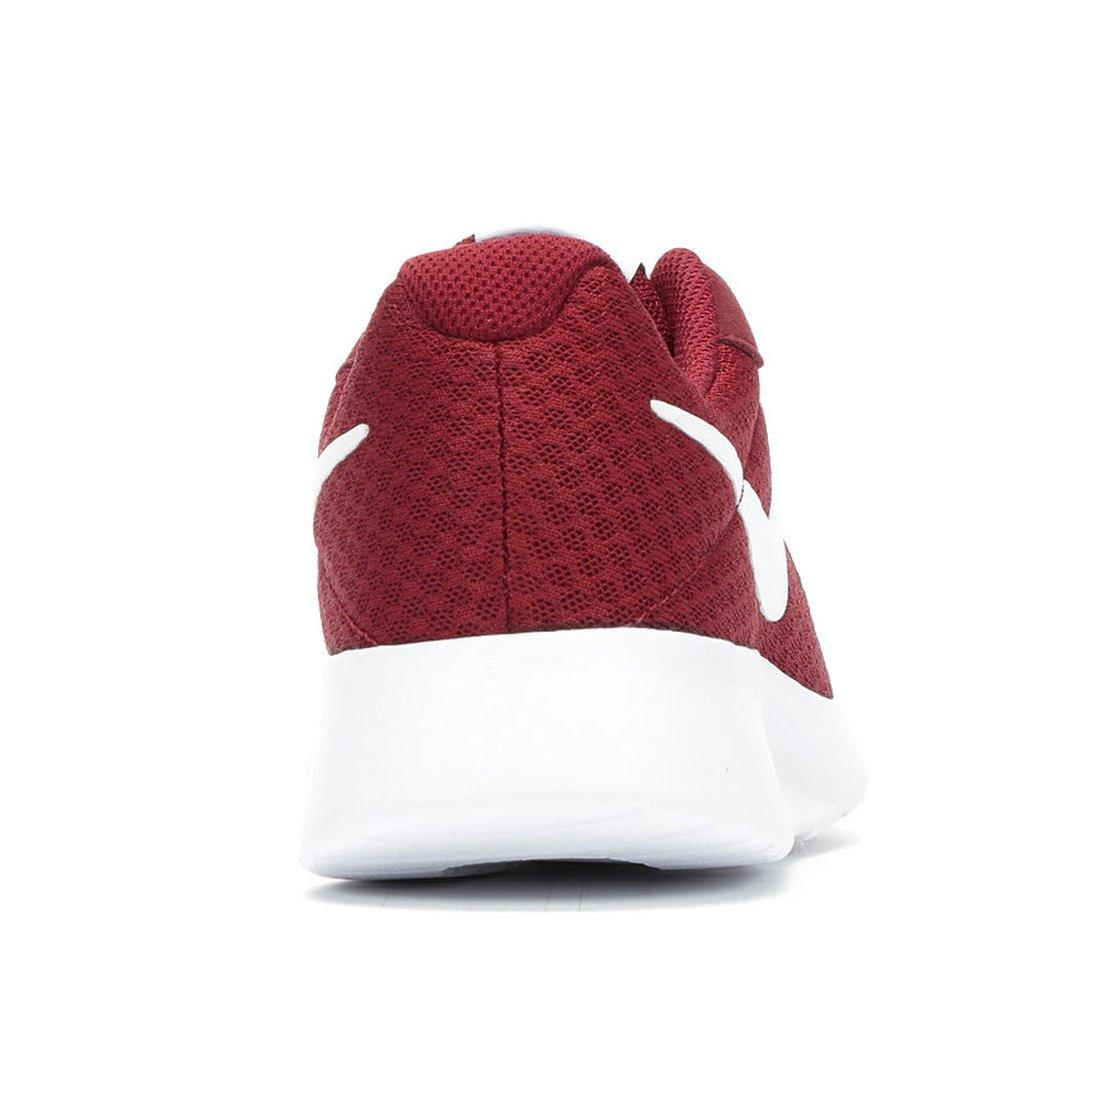 NIKE Women's Tanjun Running Shoes Red/White B074596TVZ 5 D(M) US|Team Red/White Shoes 3af6da